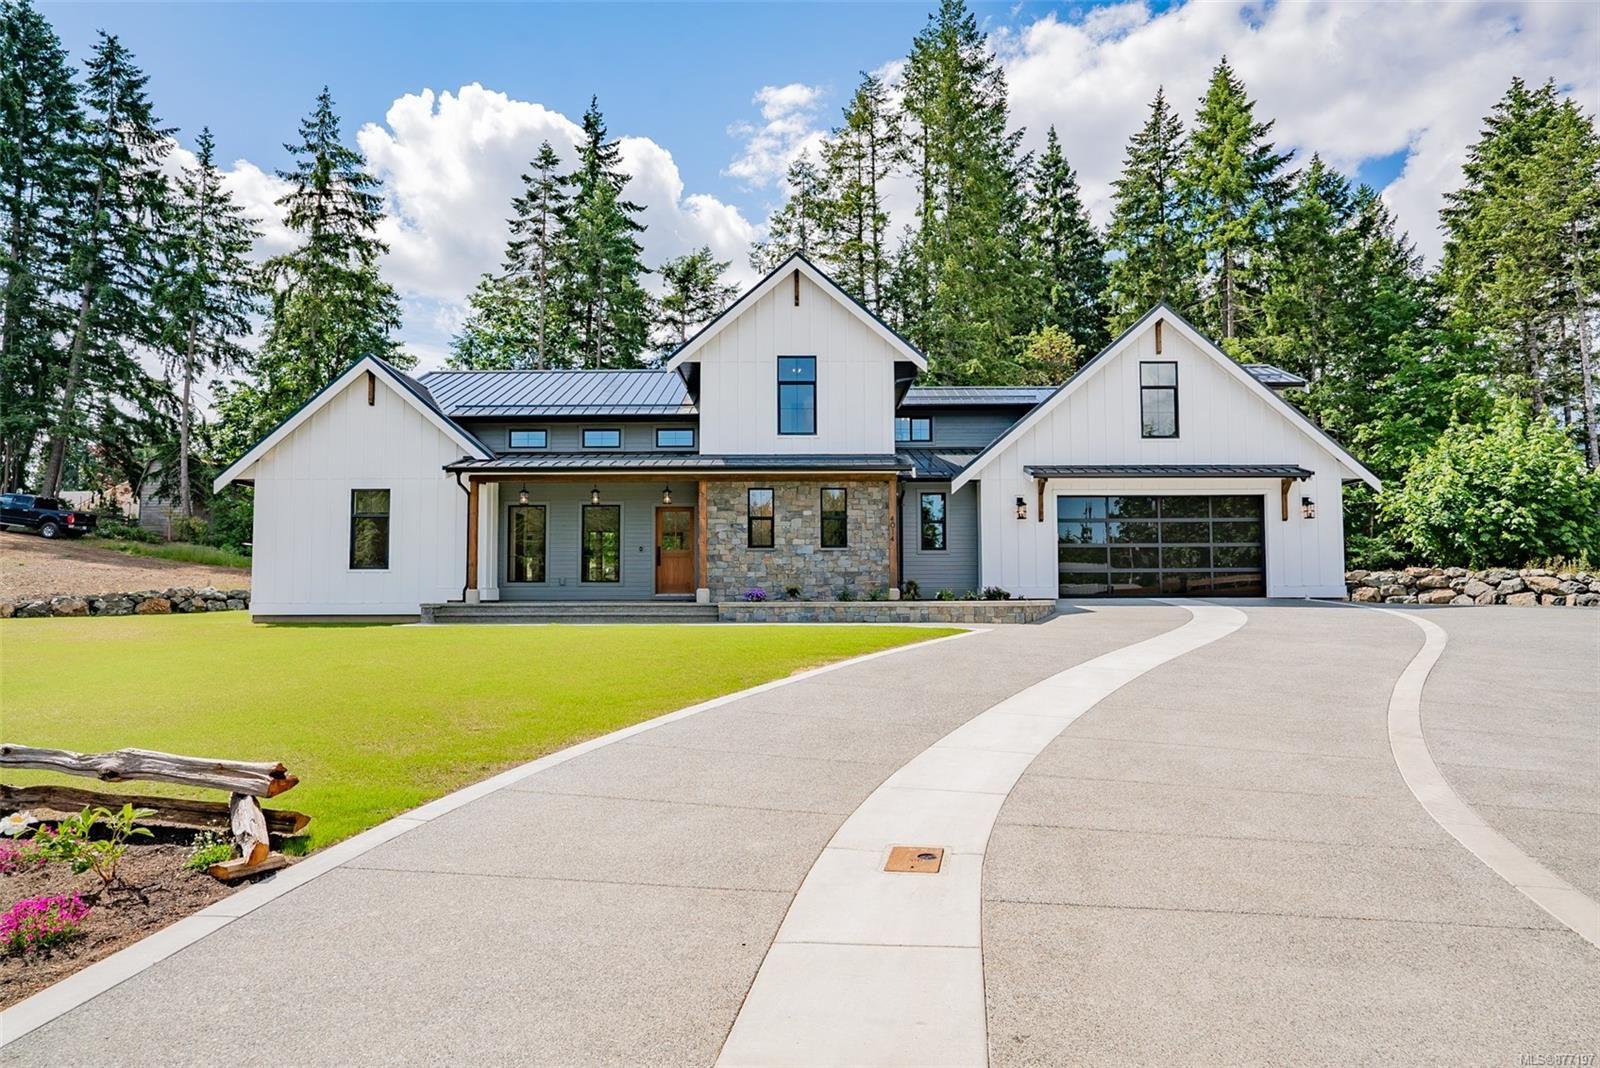 Main Photo: 4014 Wellburn Pl in : Du East Duncan House for sale (Duncan)  : MLS®# 877197